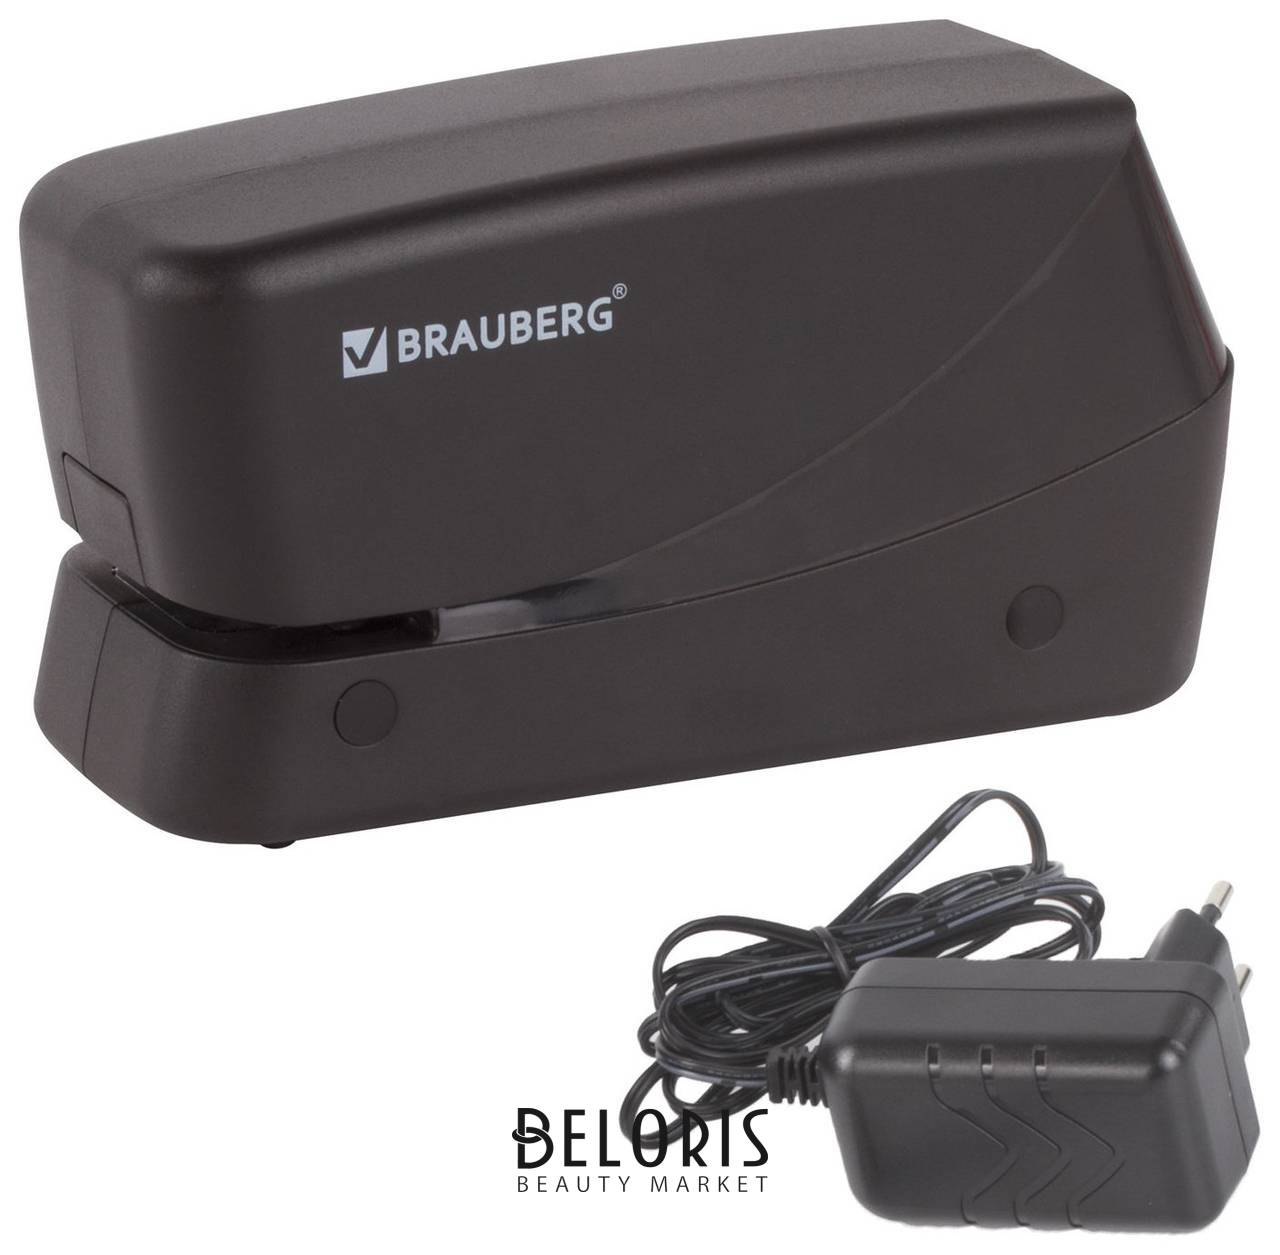 Степлер электрический №24/6, 26/6 Brauberg, до 20 листов, питание от сети/4 батареек АА, черный Brauberg